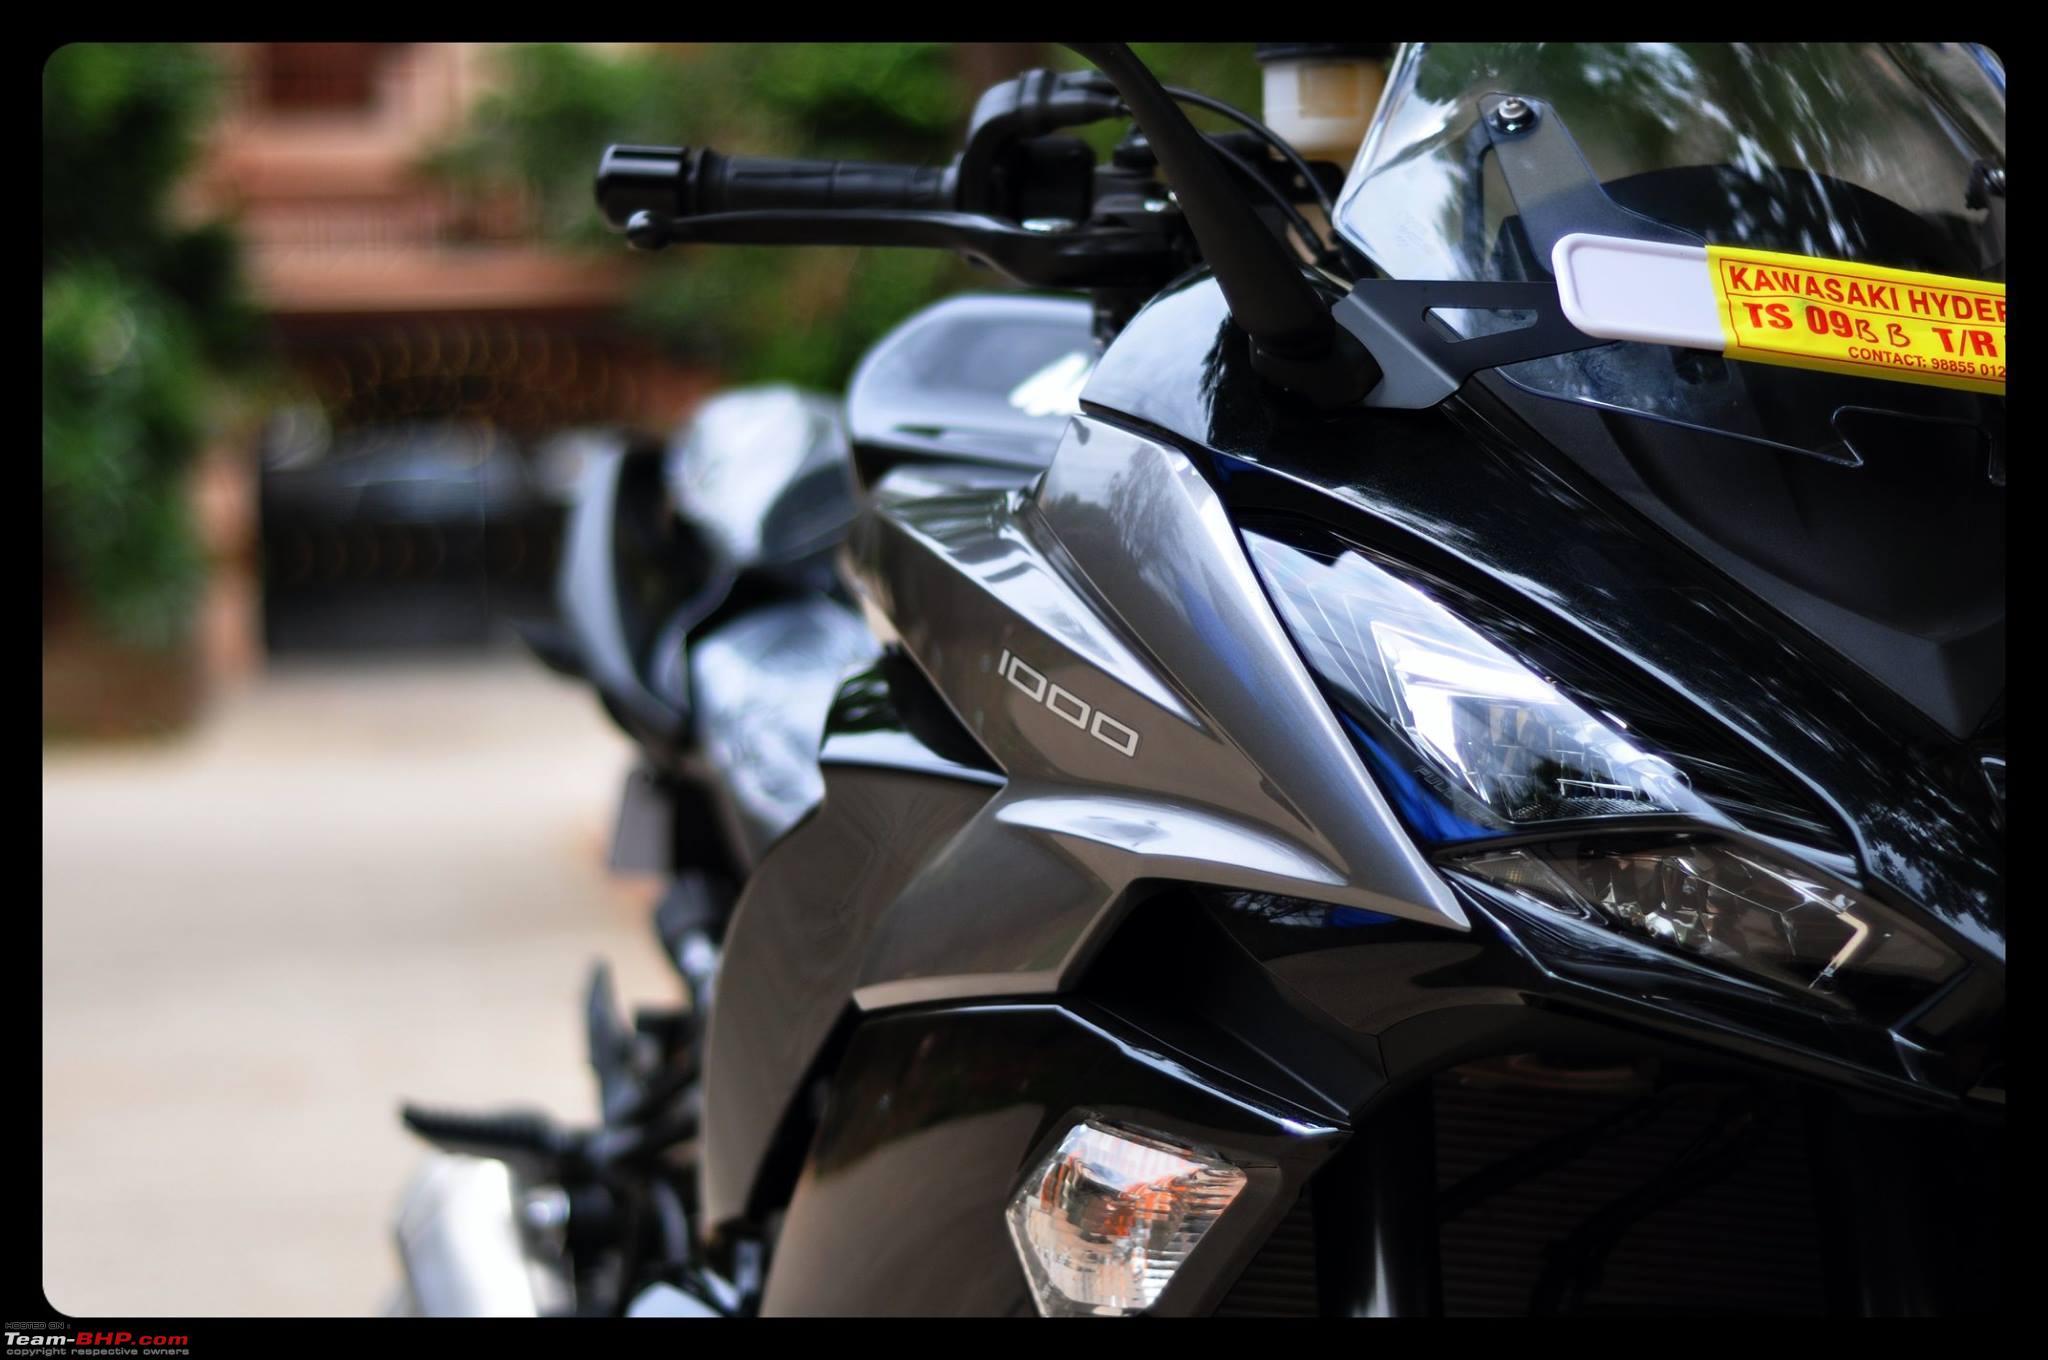 My 2017 Kawasaki Ninja 1000 9